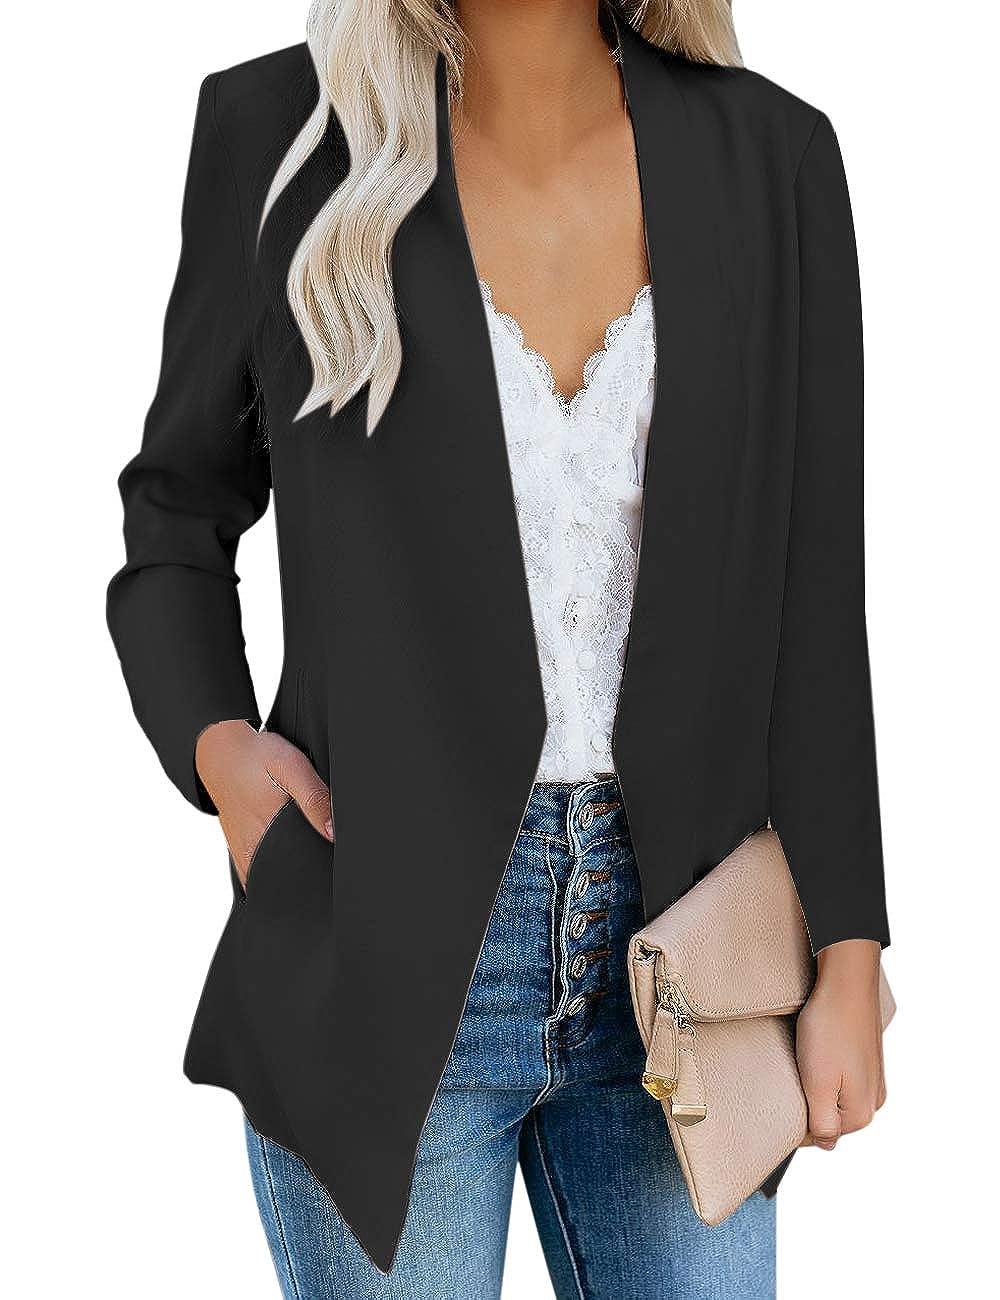 Vetinee Womens Open Front Pocket Blazer Long Sleeve Work Office Cardigan Jacket